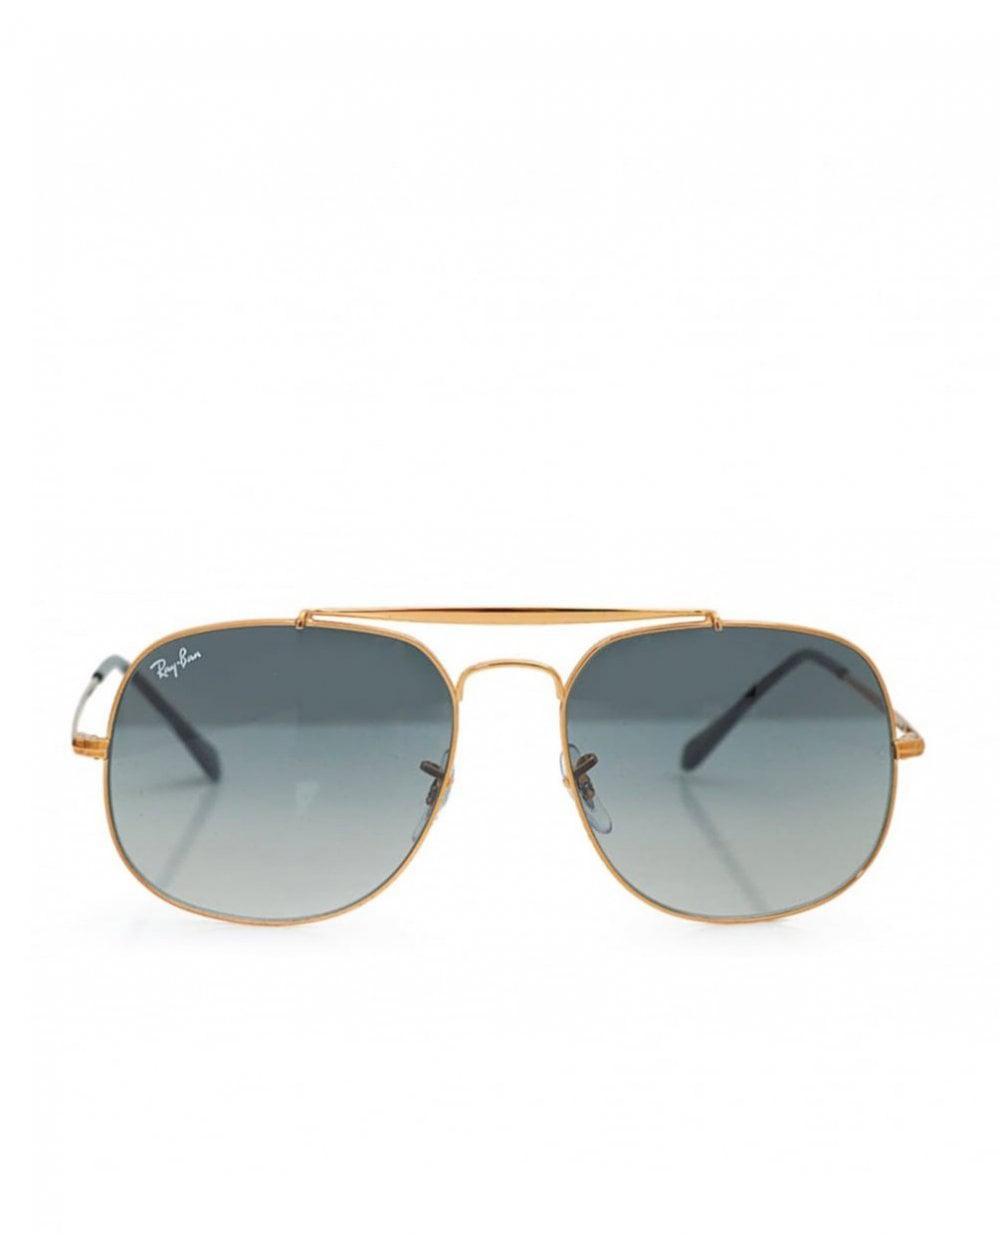 620500e37b Ray-Ban Double Bridge Sunglasses for Men - Lyst